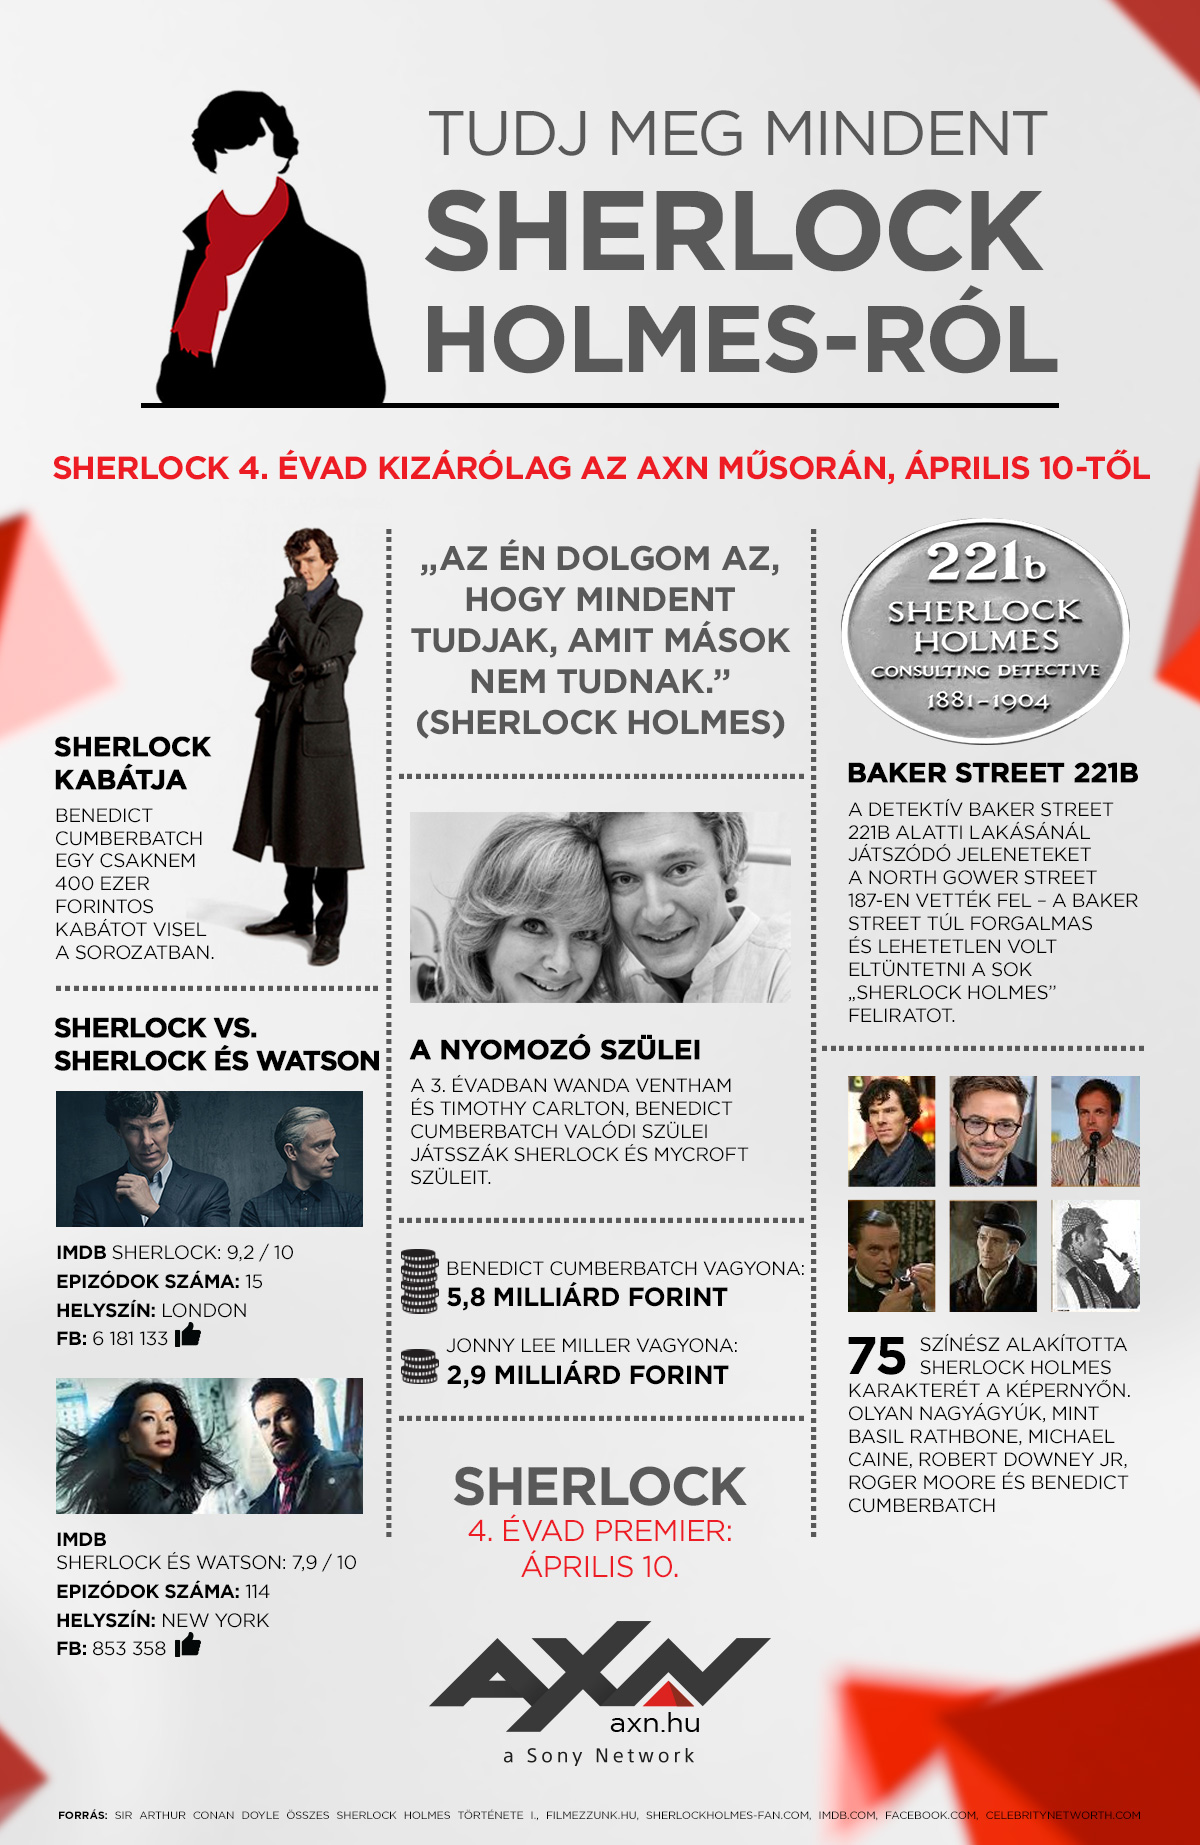 tudj_meg_mindent_sherlock_holmes-rol_infografika.jpg